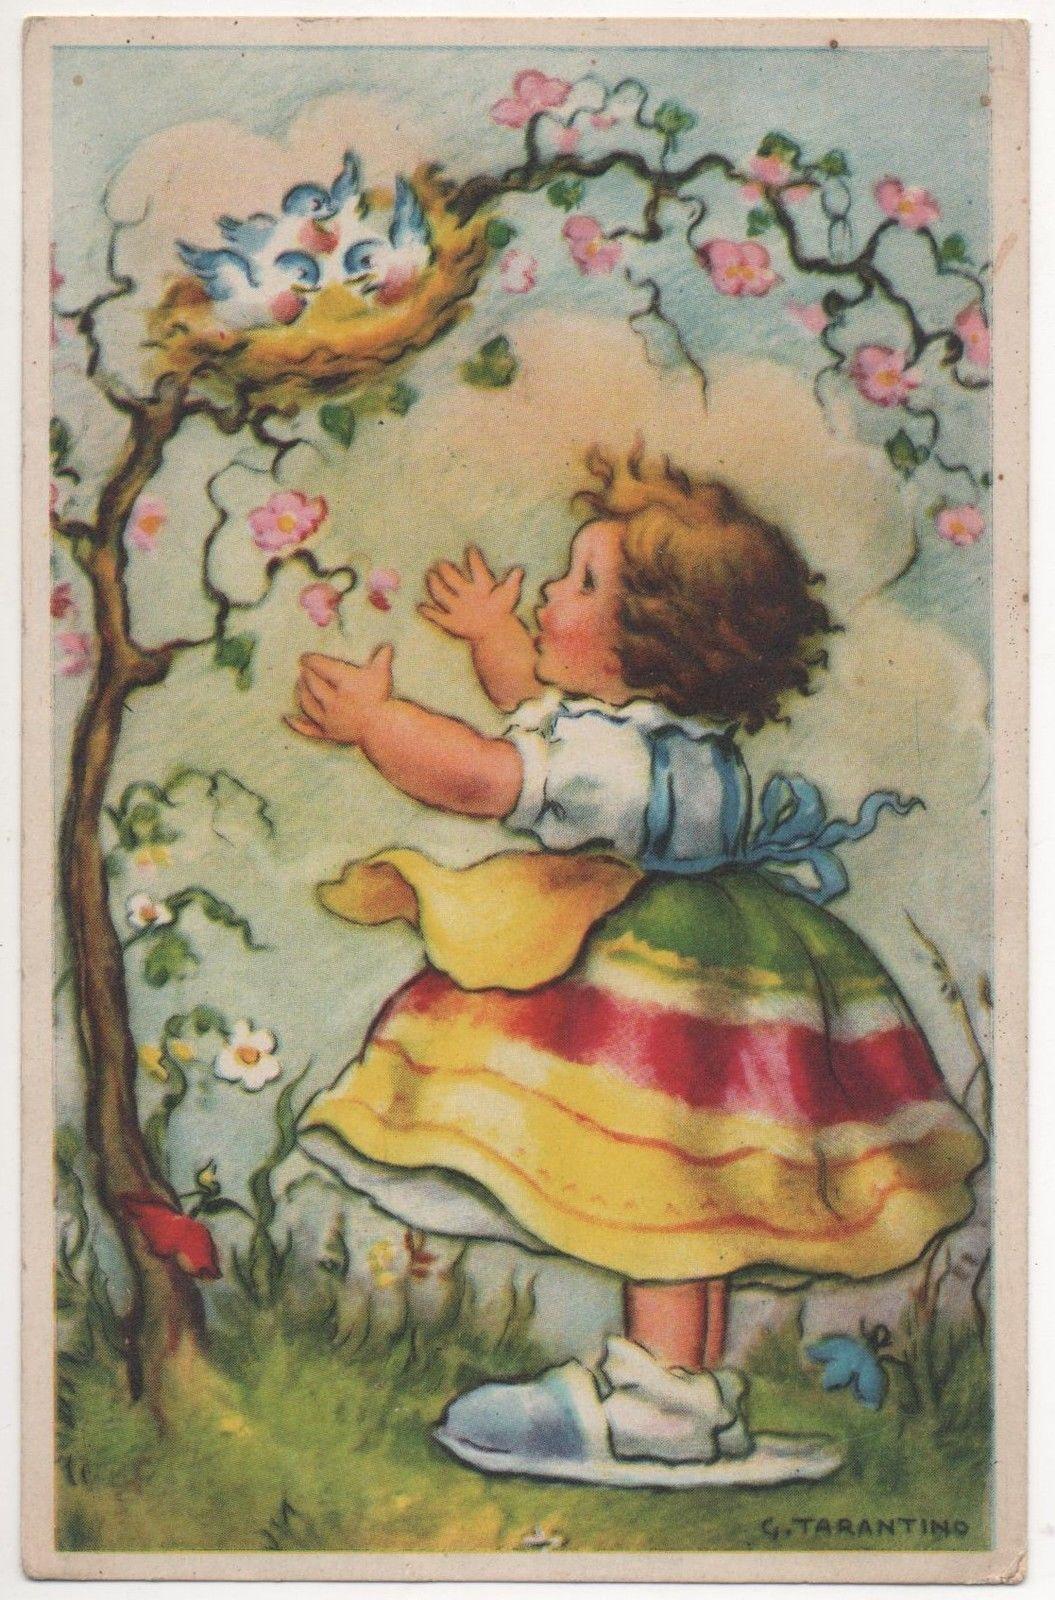 Cpa Carte postale ancienne Dessin d'enfants Tarantino | eBay